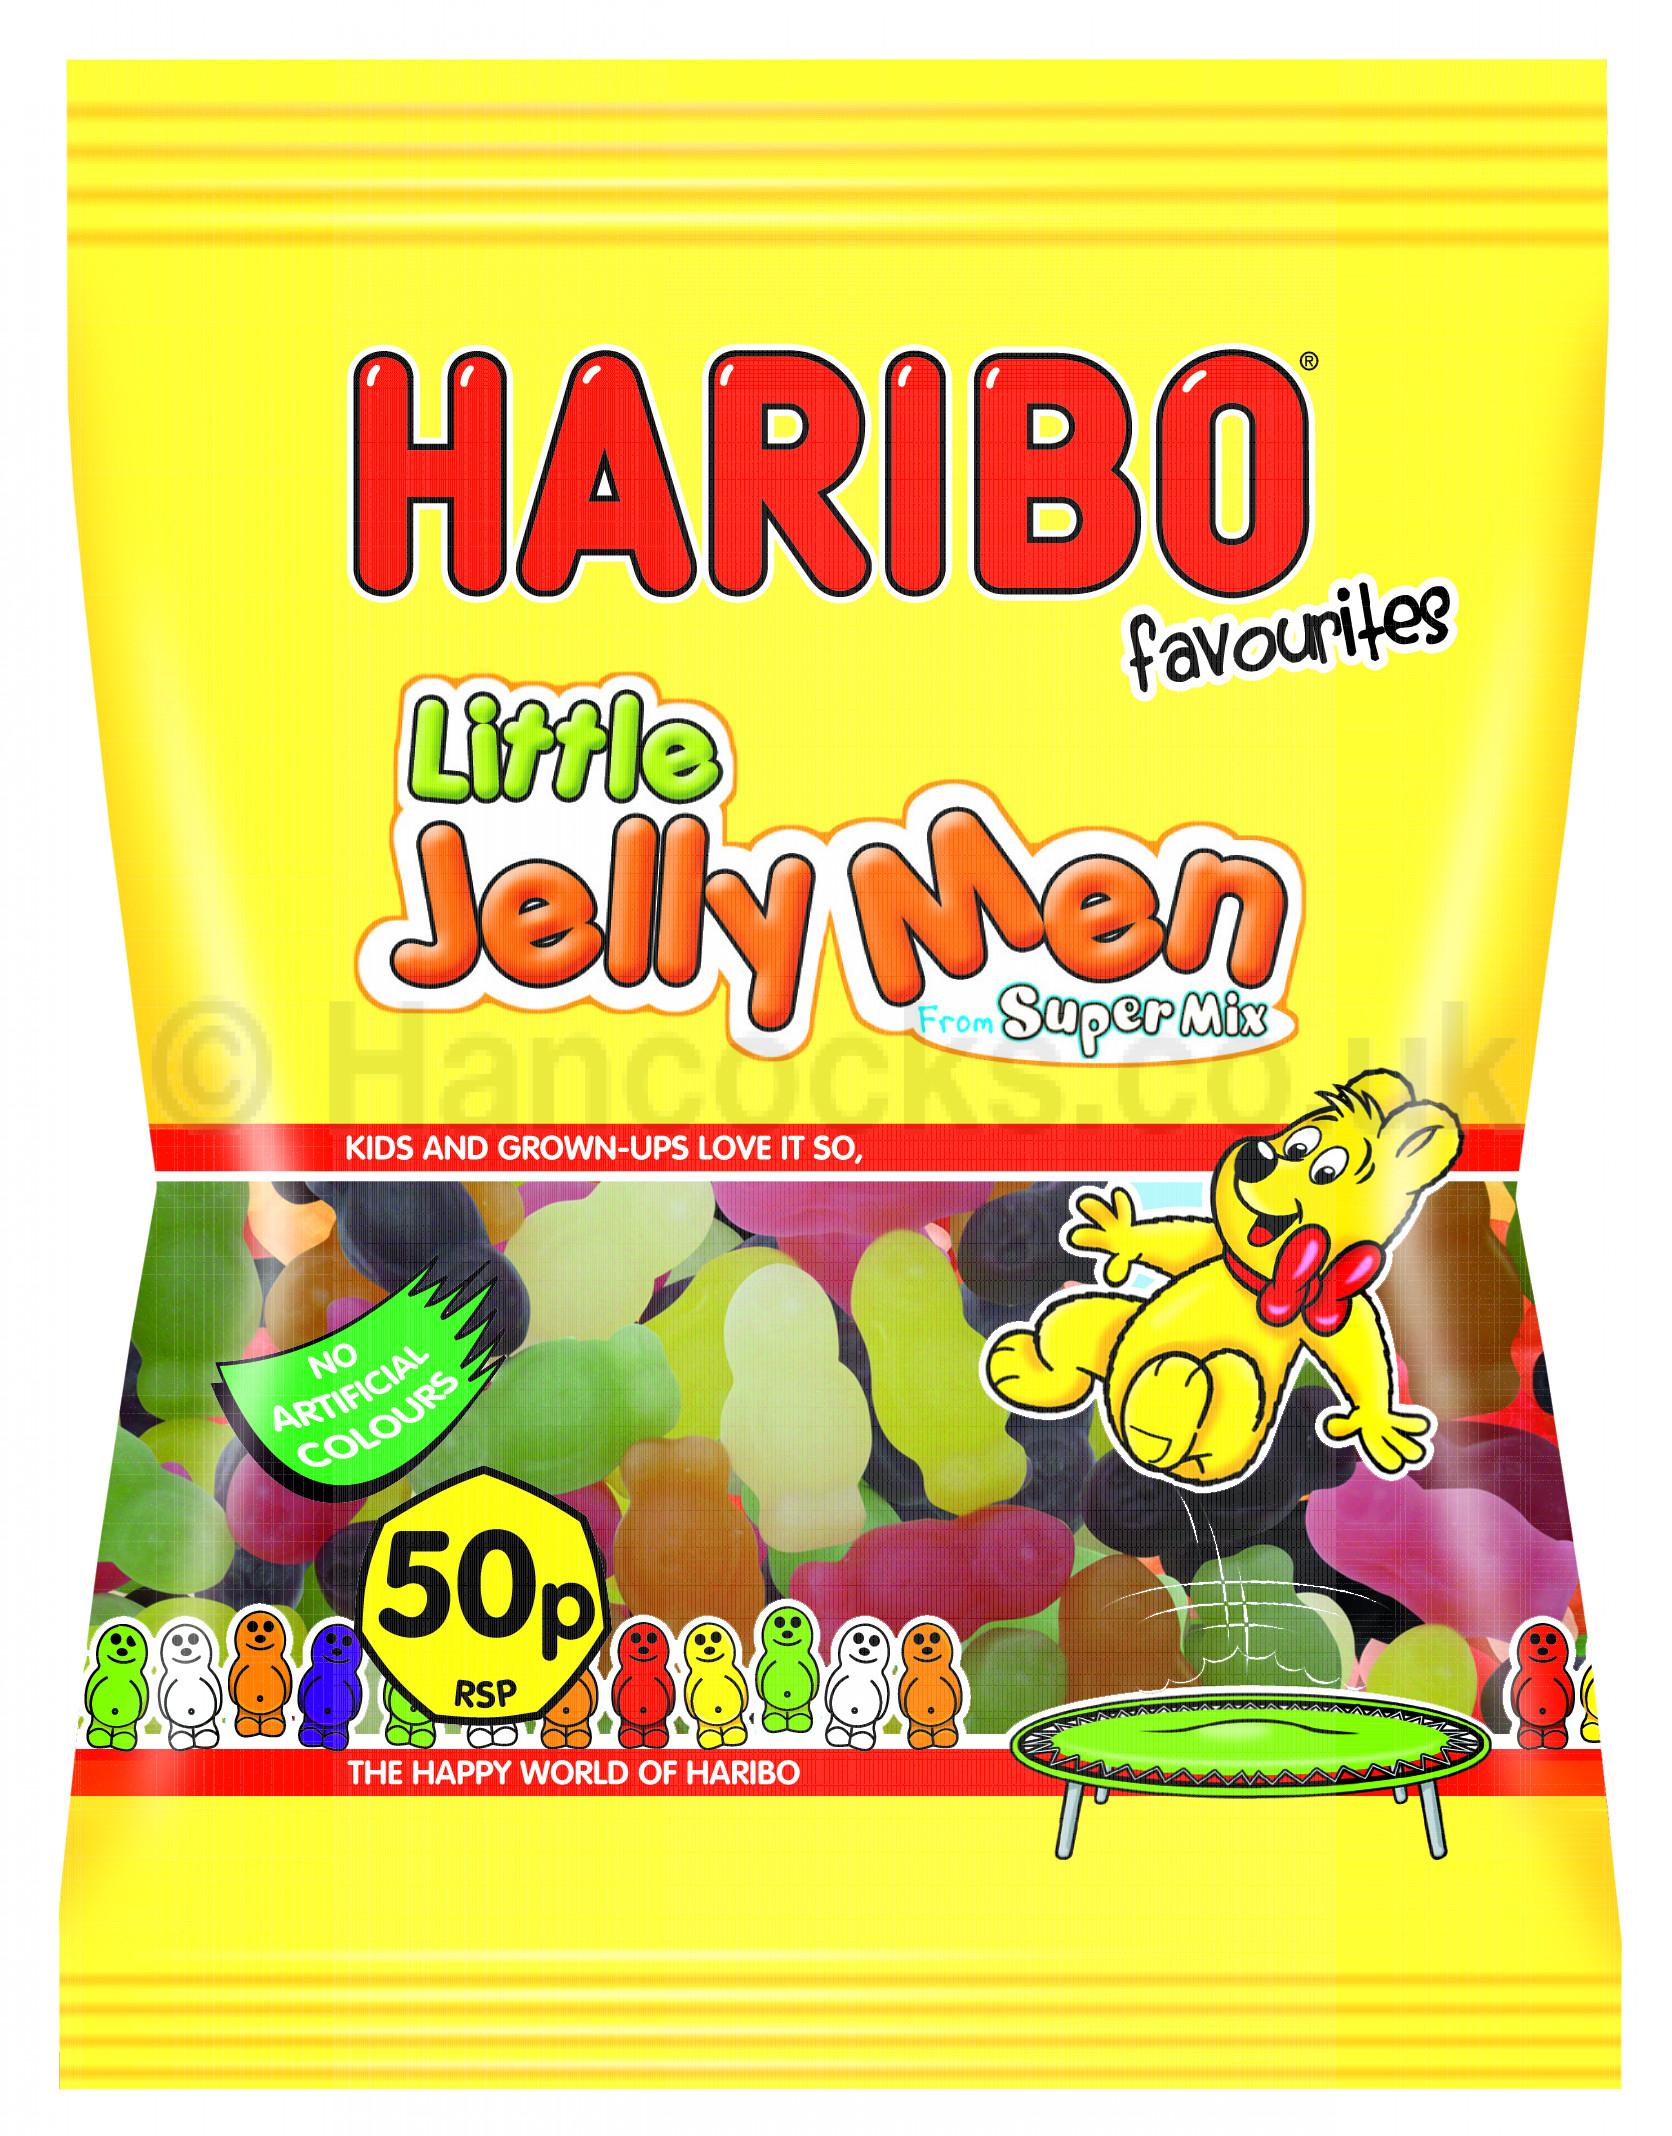 Haribo Jelly Babies / Fizzy SeaWorld 300g @ B&M - £1